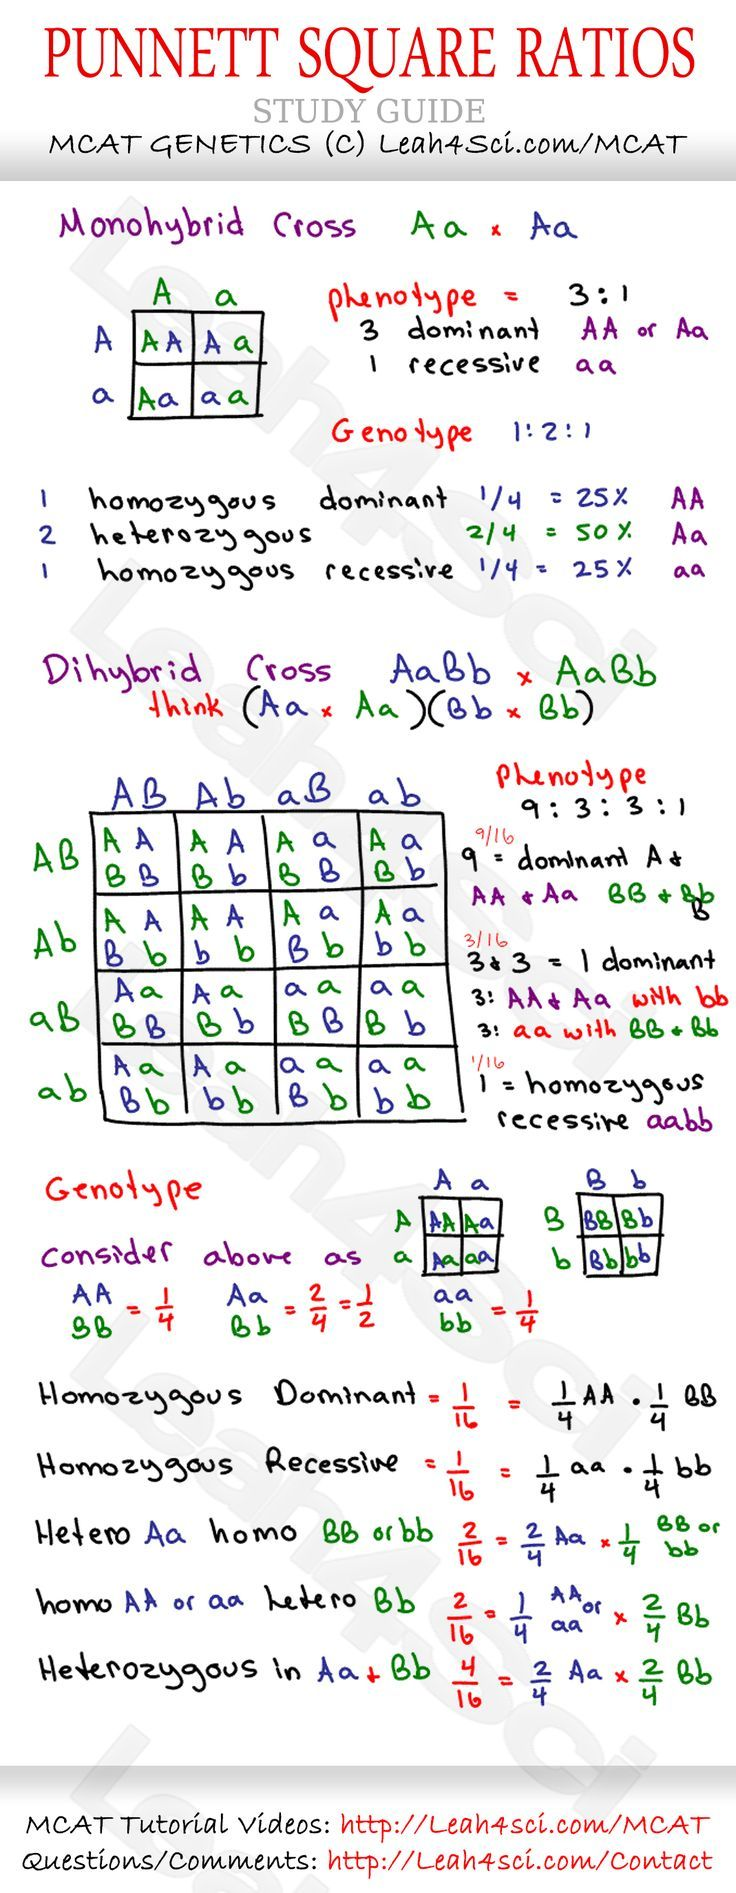 Punnet Square Ratios Mcat Genetics Cheat Sheet Study Guide Jpg 1 069 2 750 Pixels Biology Lessons Biology Classroom Teaching Biology